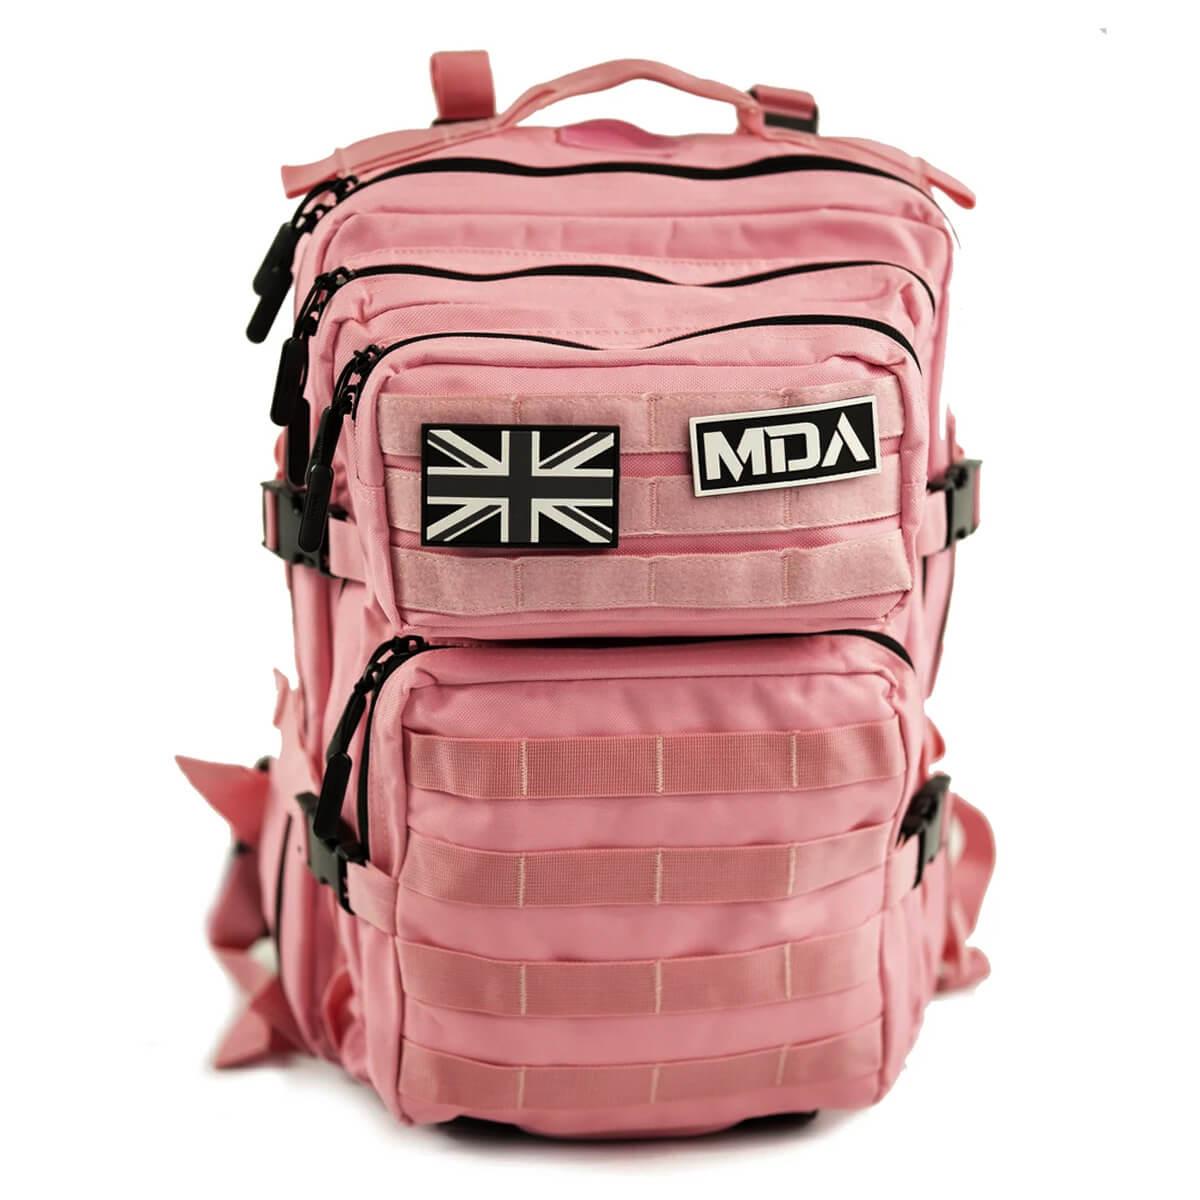 thumbnail 9 - Modern Day Athlete Unisex 2021 MD25 Waterproof Gym Training Backpack Rucksack